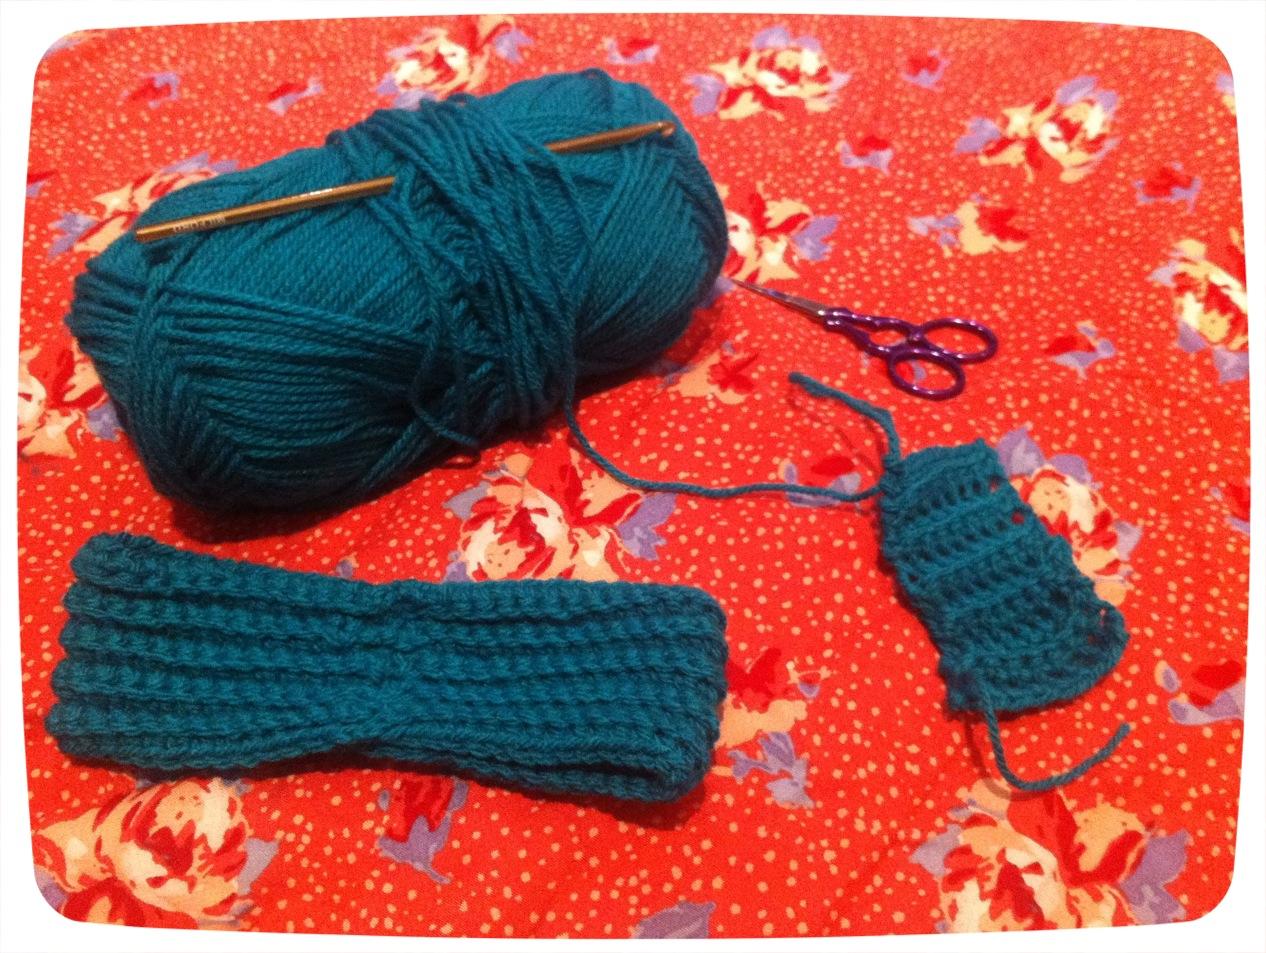 Making crochet bows